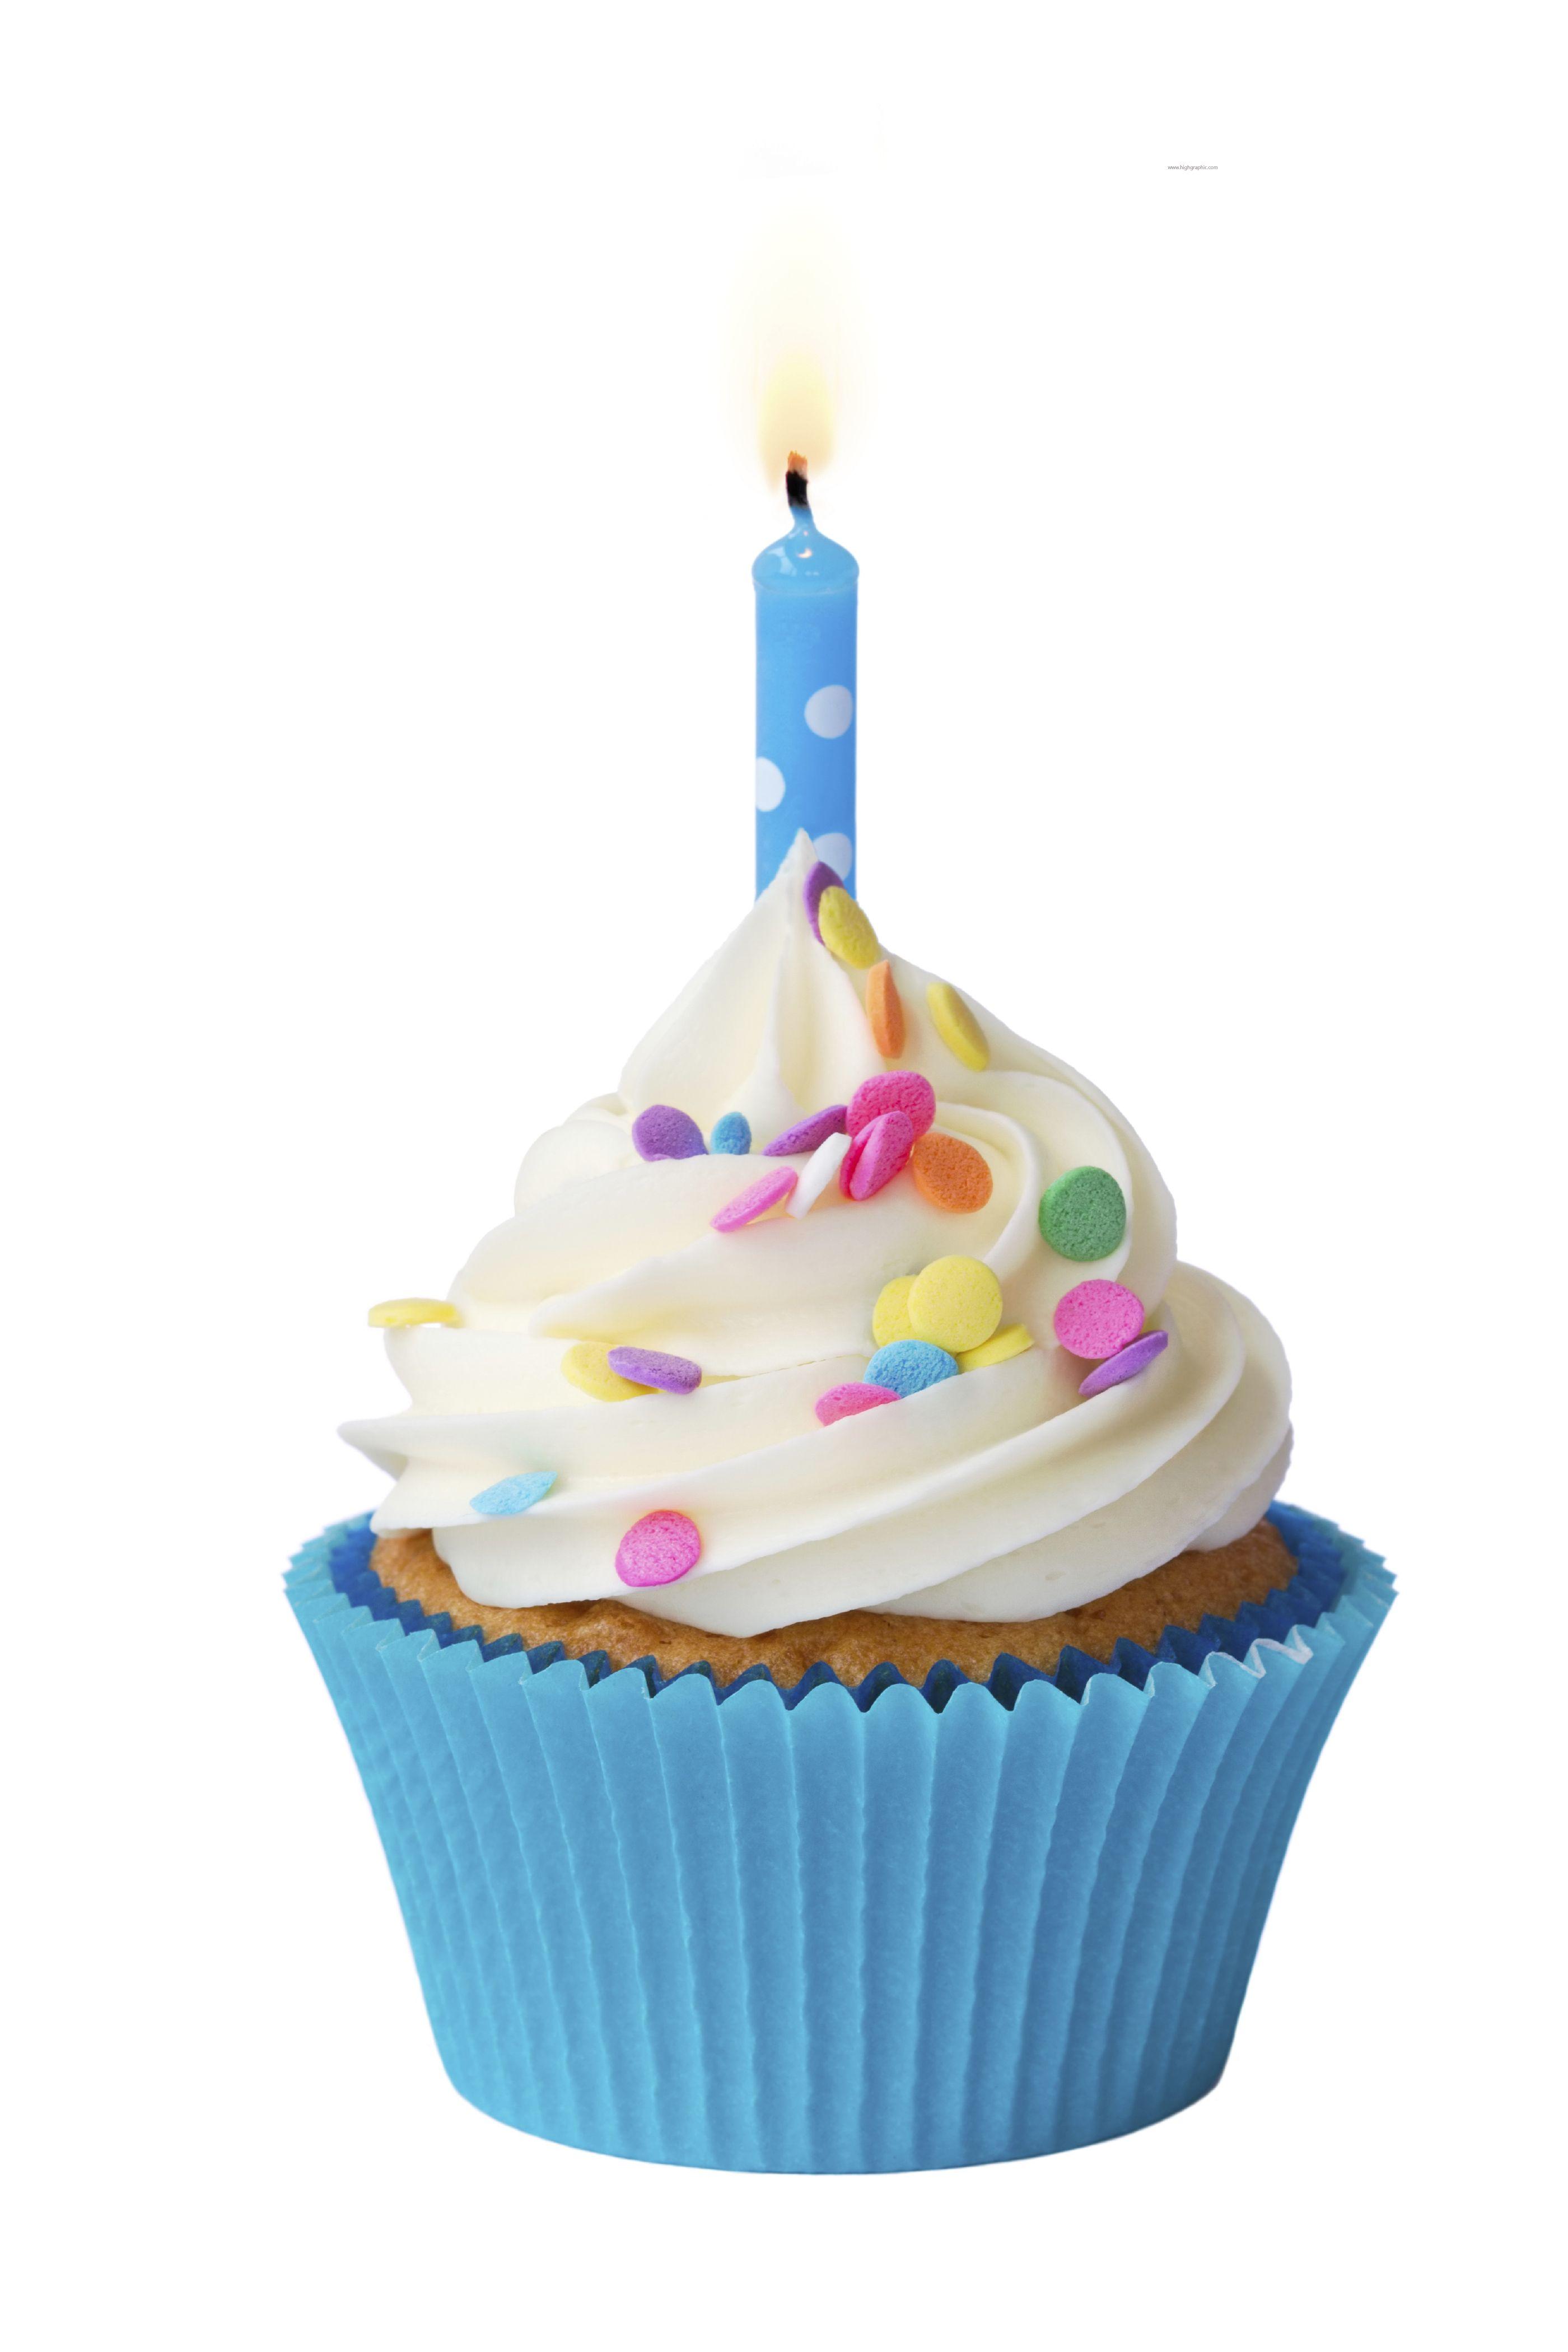 Birthday Cupcake Cartoon High Graphic Birthday Cupcakes Happy Birthday Cupcakes Frappuccino Flavors